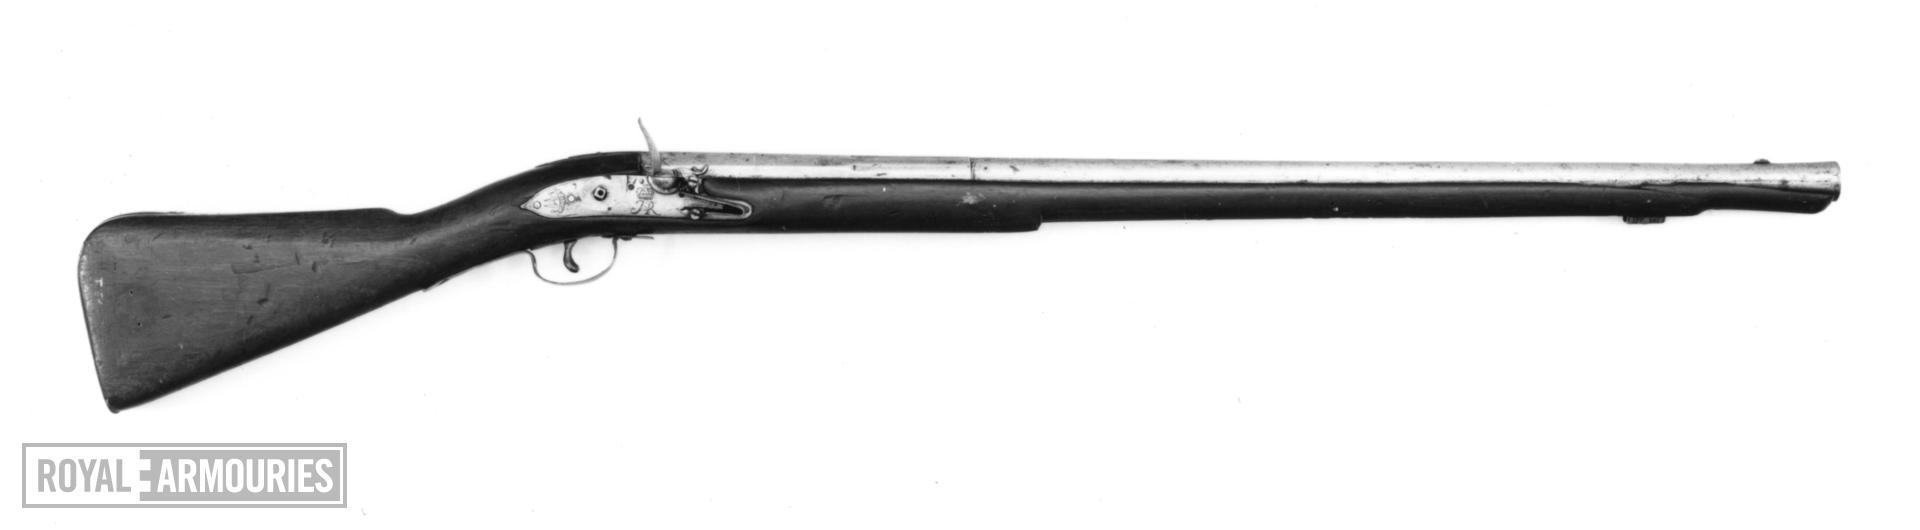 Flintlock muzzle-loading military musket - By Brooke